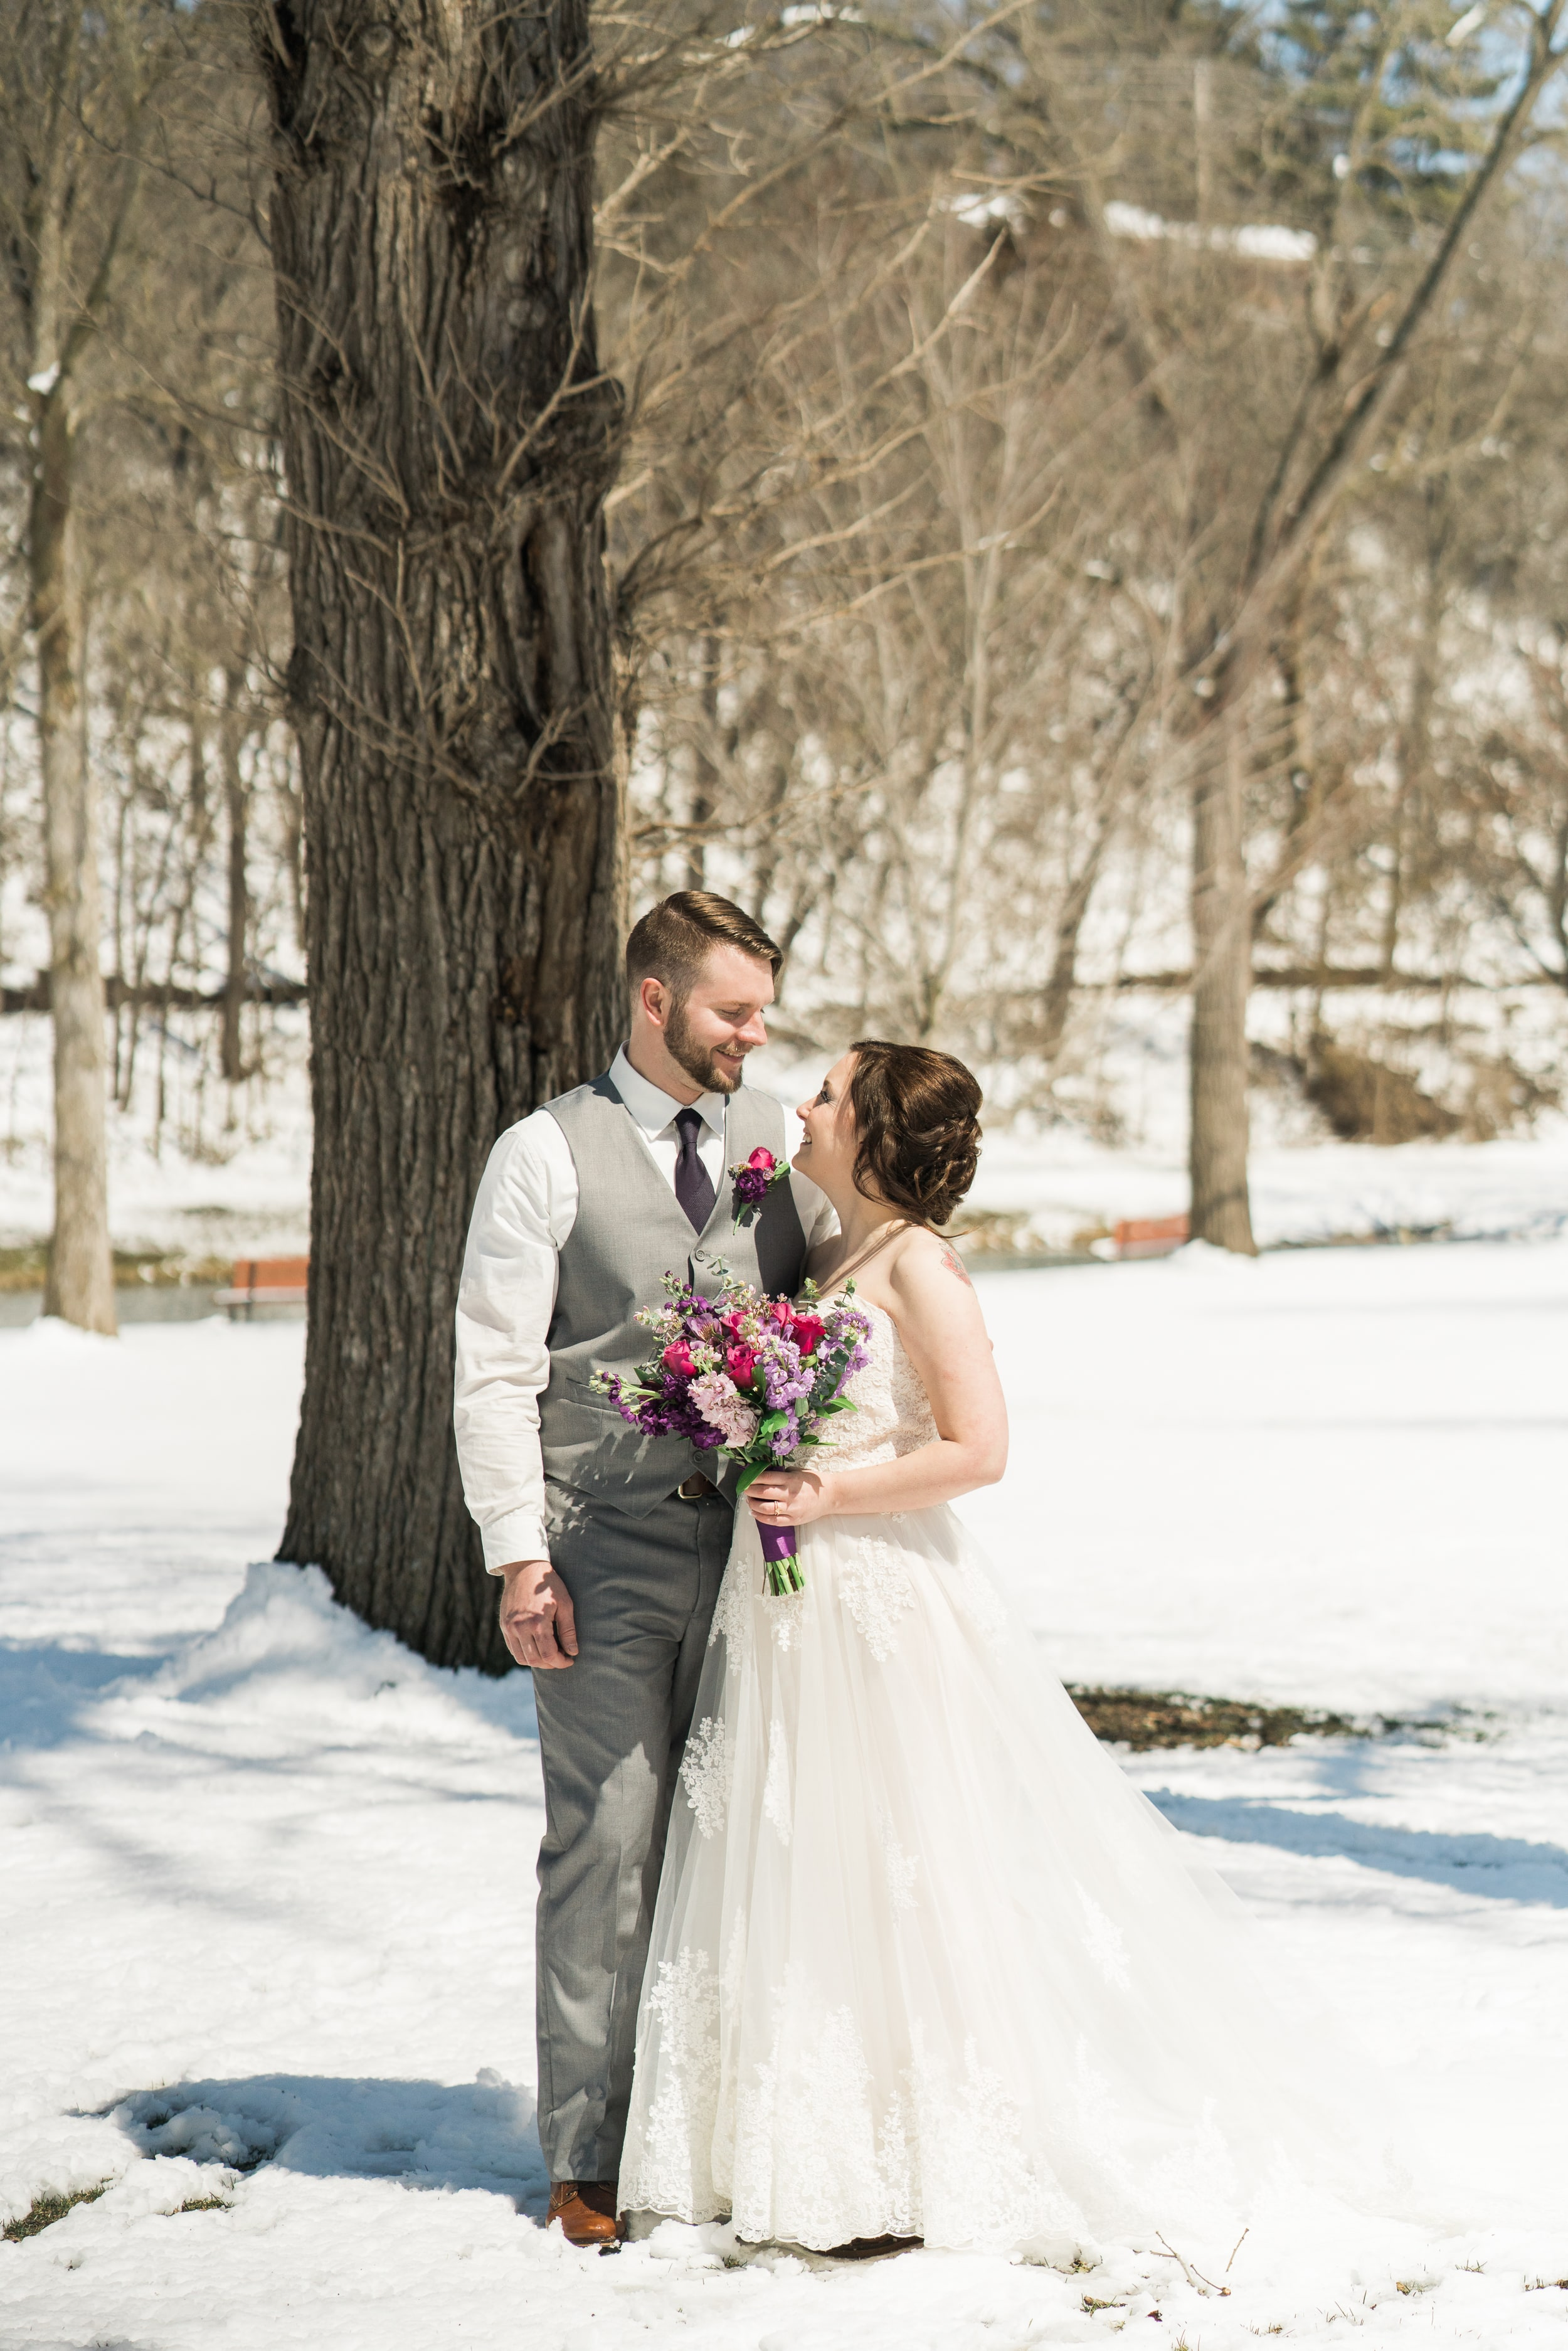 snowy-intimate-wedding-18.jpg